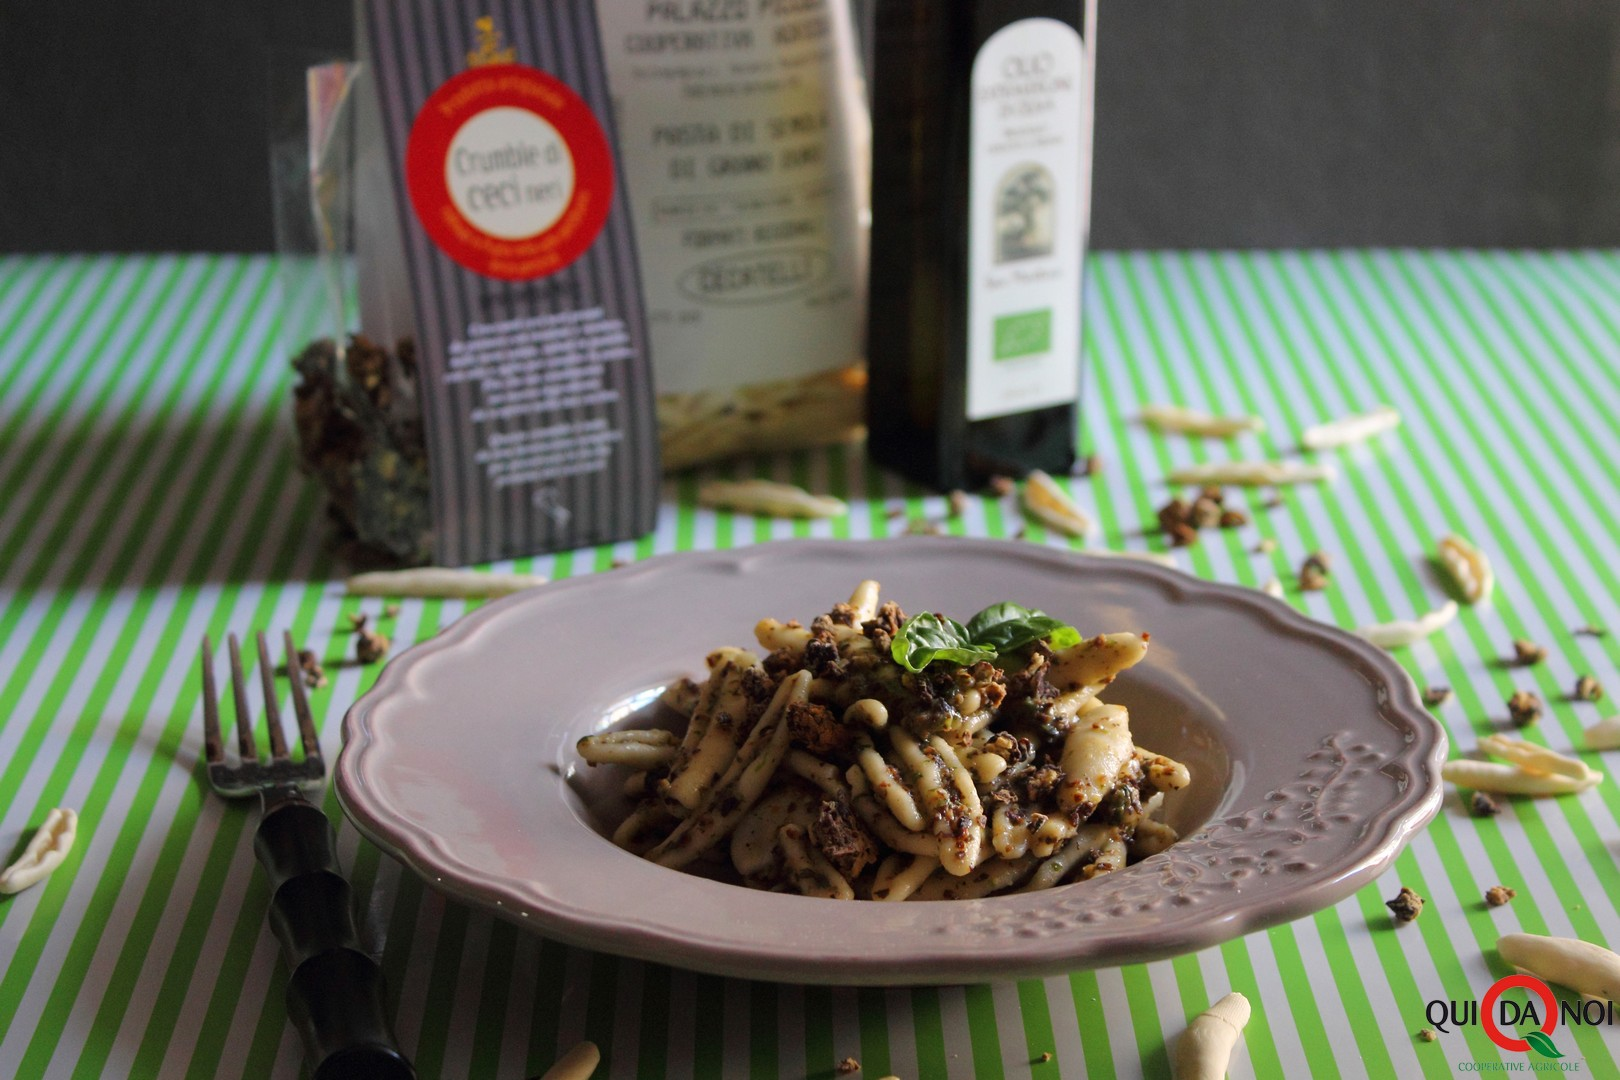 Cecatelli-Pesto-Aromi-Ceci_IMG2_Uberti